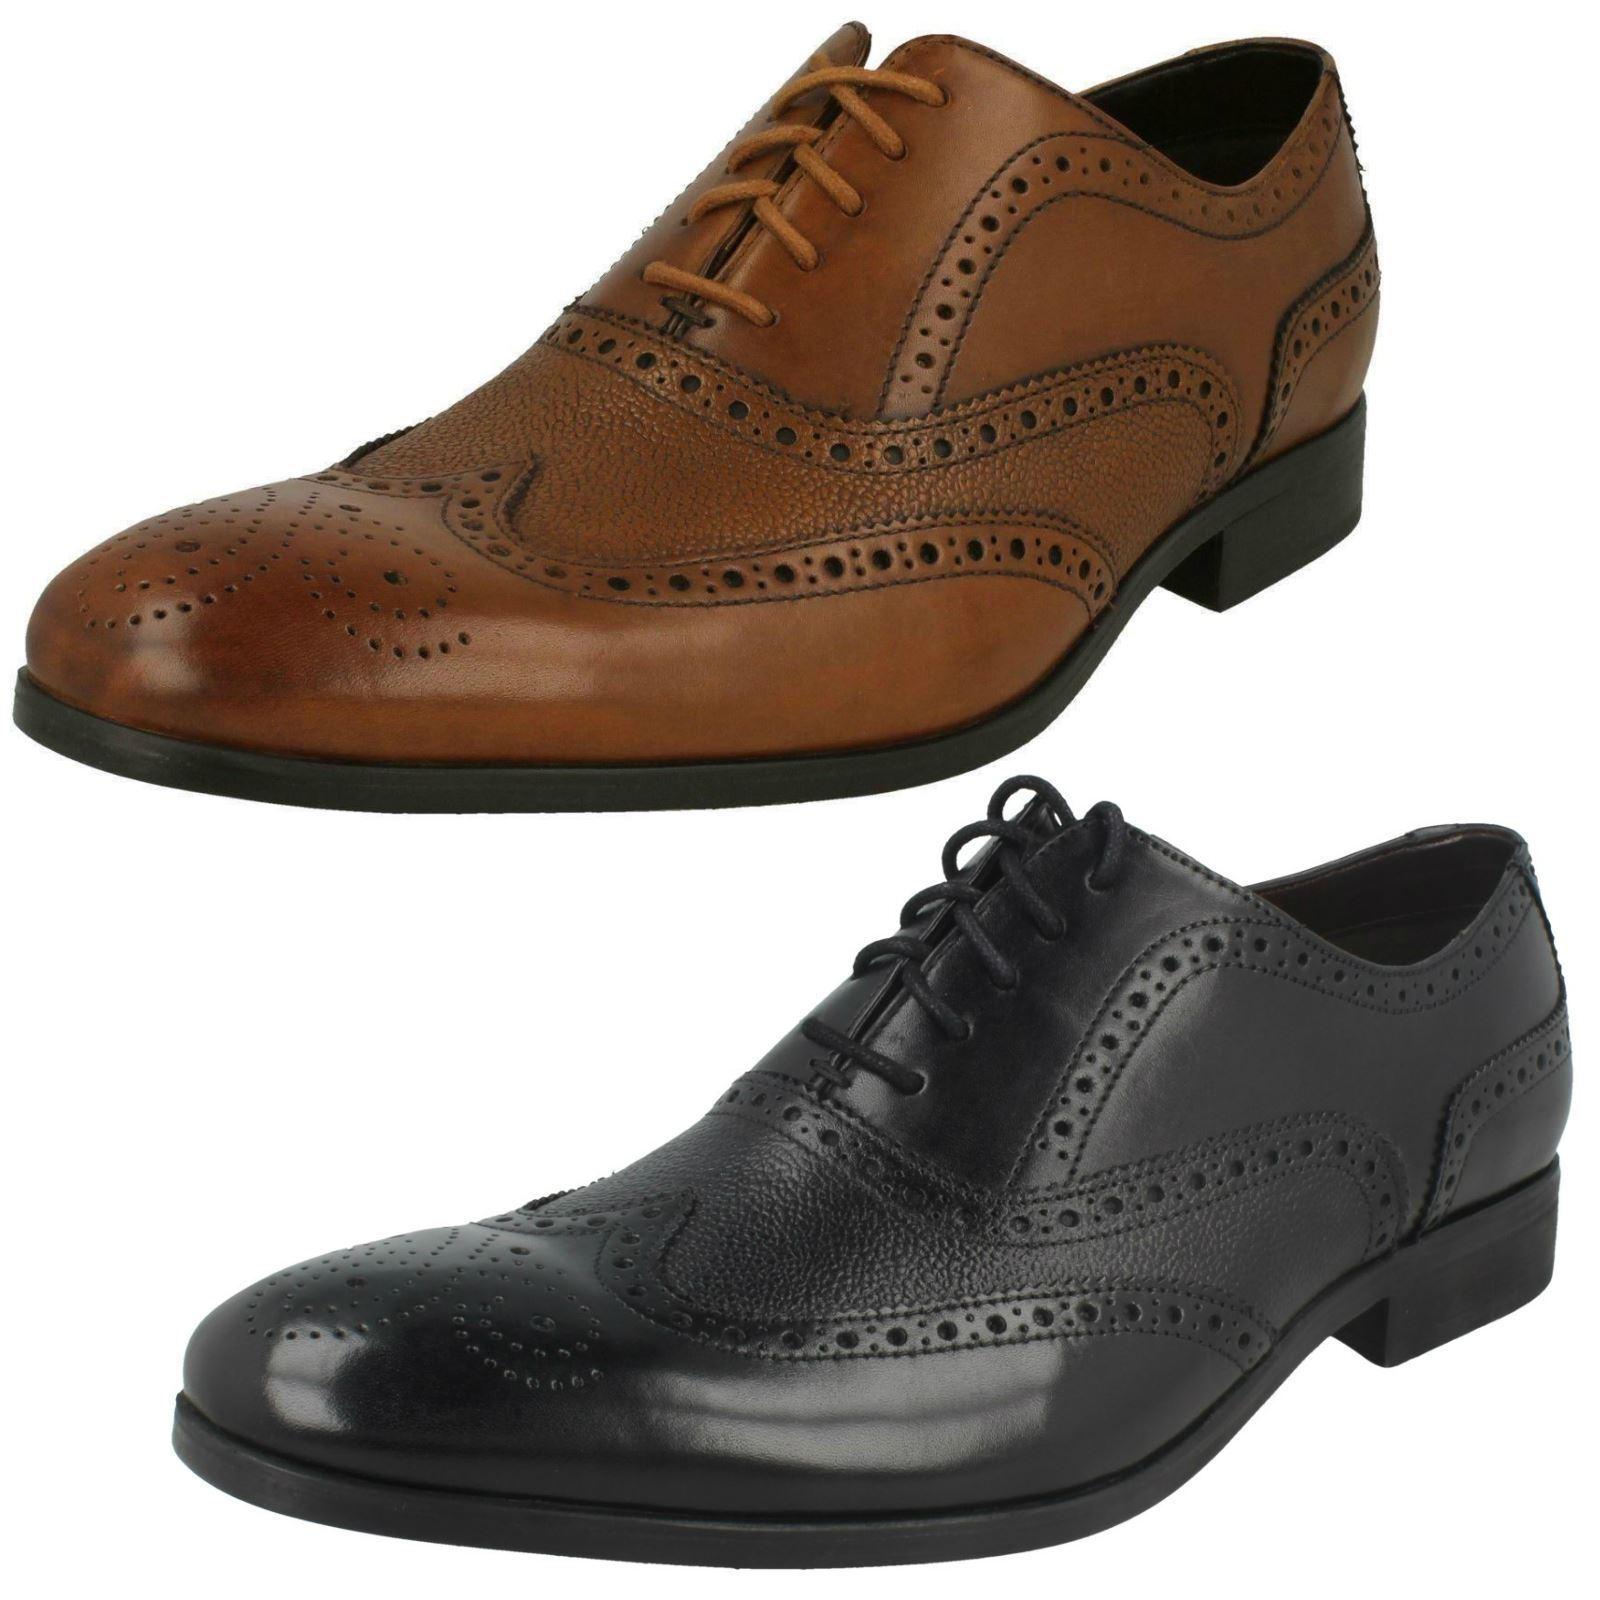 Mens Clarks Lace Up Brogue shoes 'Gilmore Limit'